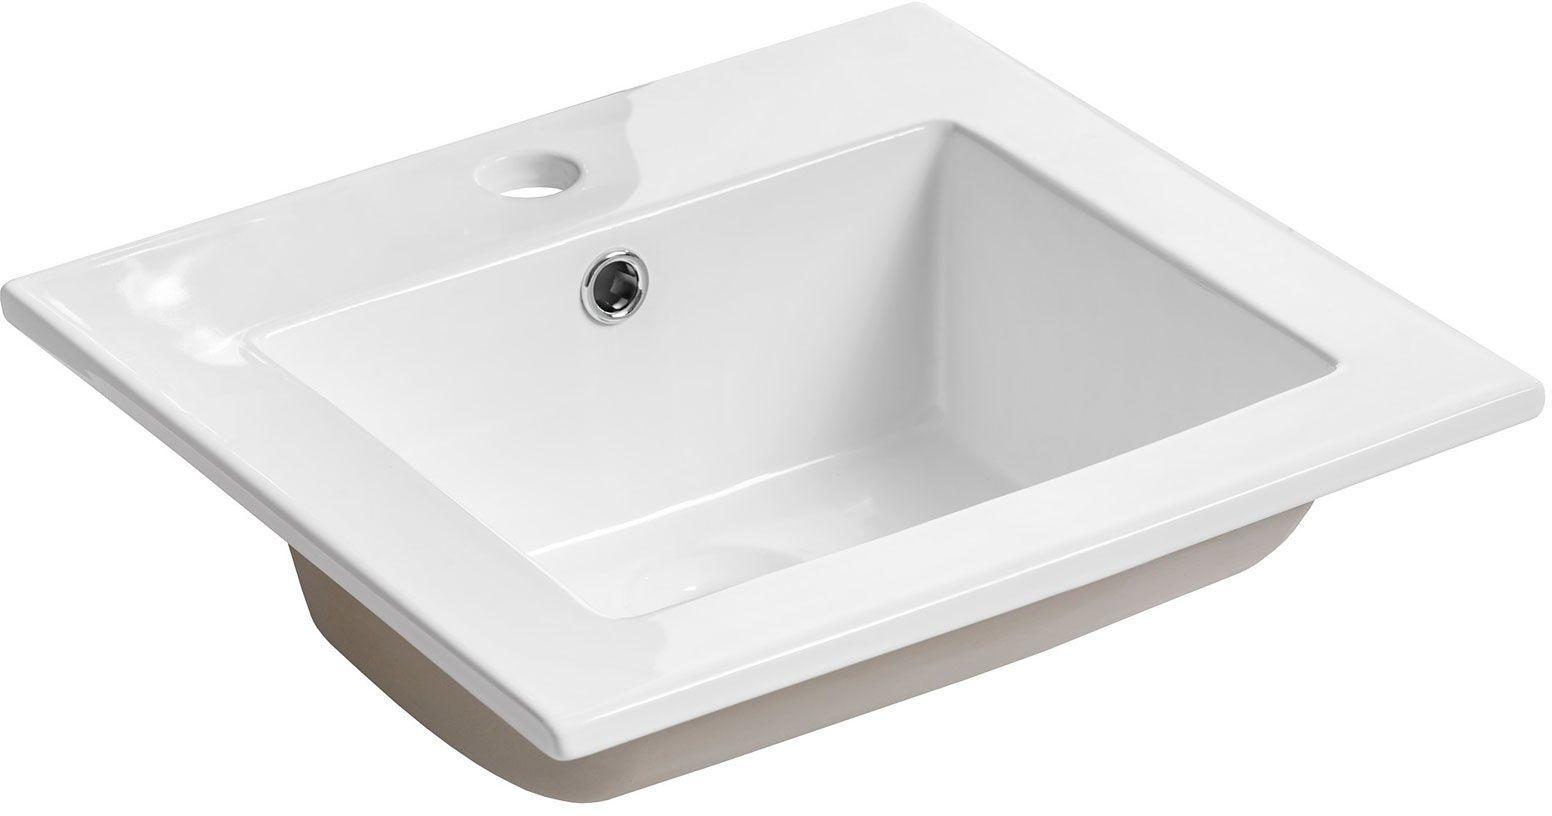 Ceramiczna umywalka meblowa Roko 2S prostokątna